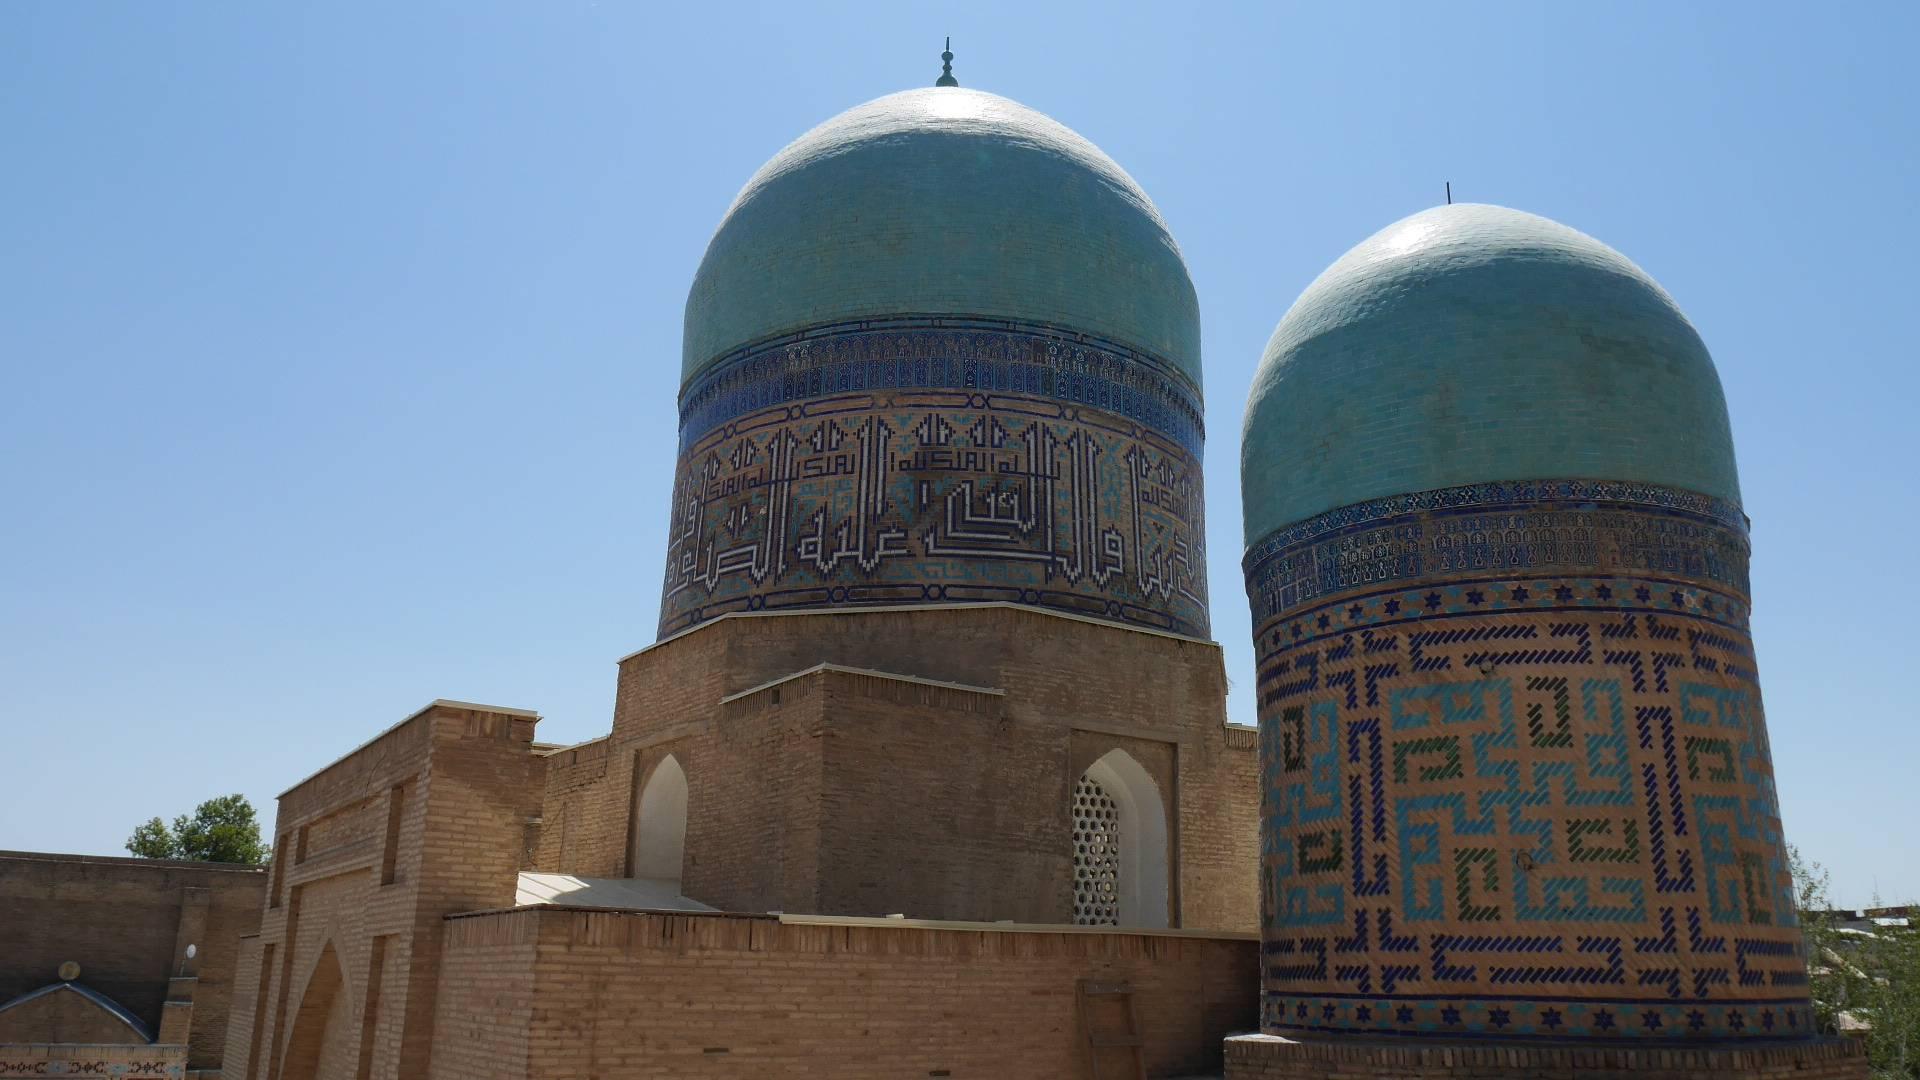 Photo 3: Shah-i-Zinda, Samarcande, le coeur de la route de la Soie